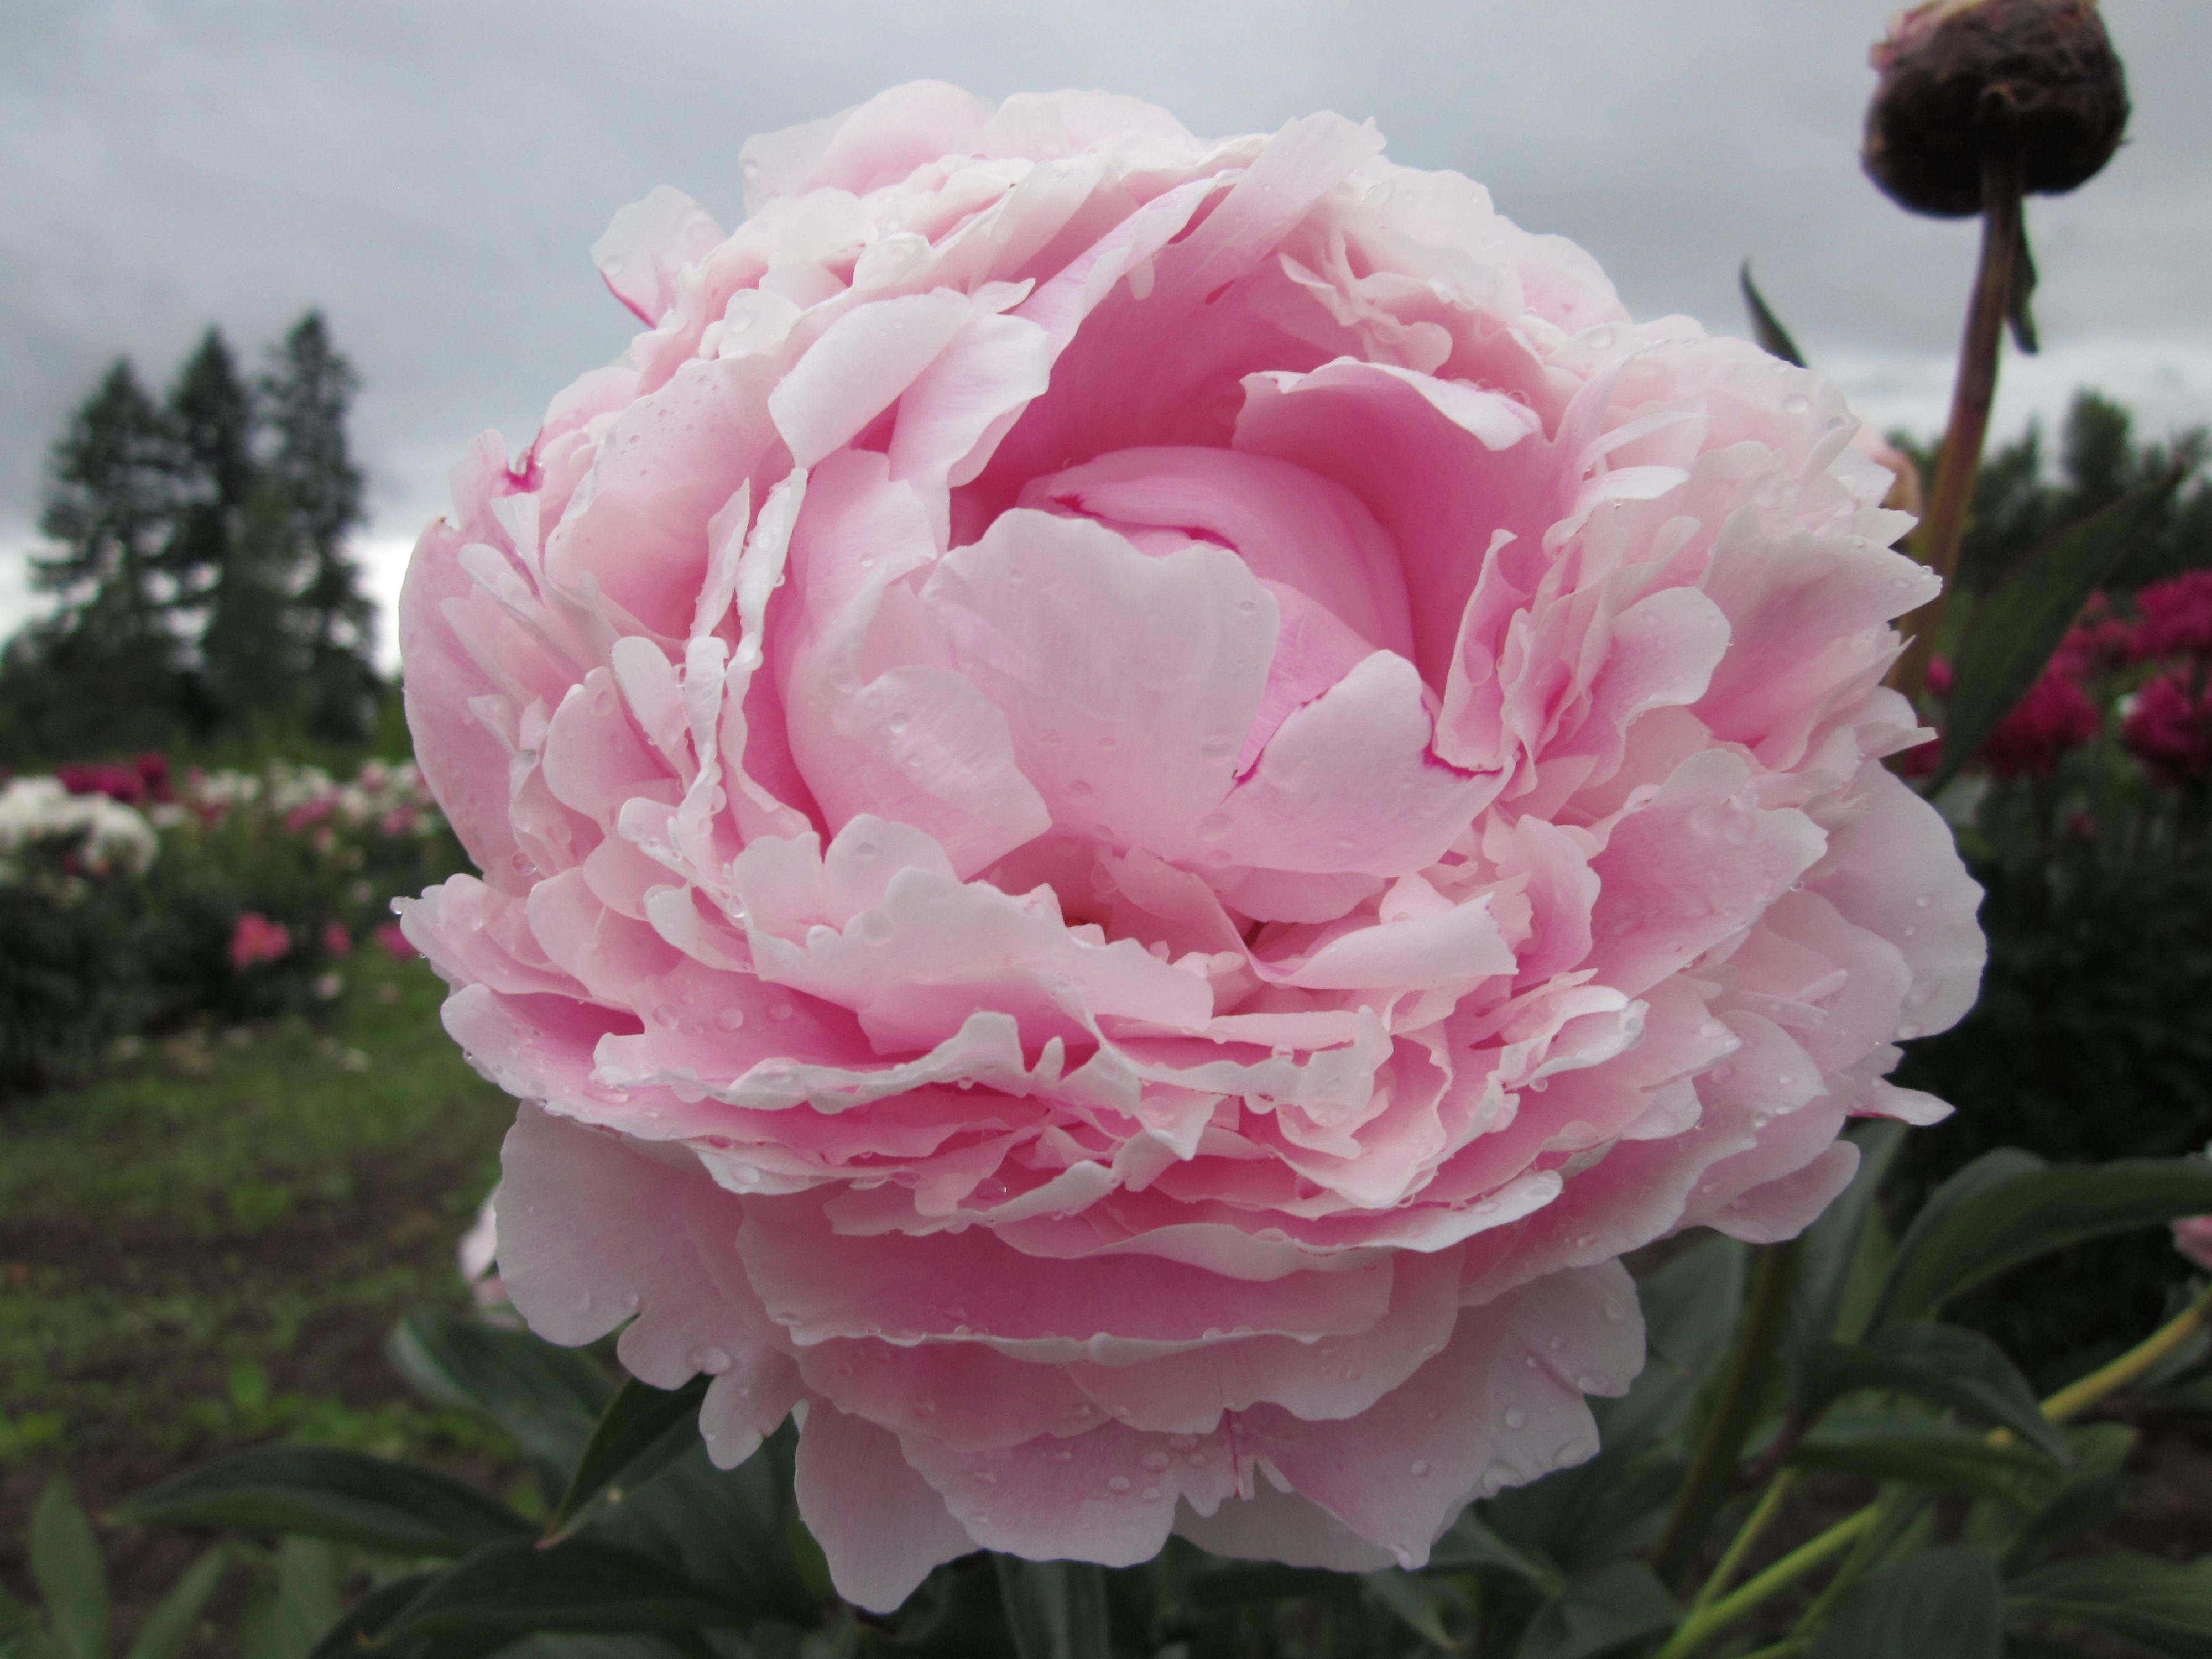 Peony Sarah Bernhardt Lemoine 1906 Easy To Grow Herbaceous Peony Plants Grow Your Own Flower Garden Peonies Garden Planting Peonies Peonies